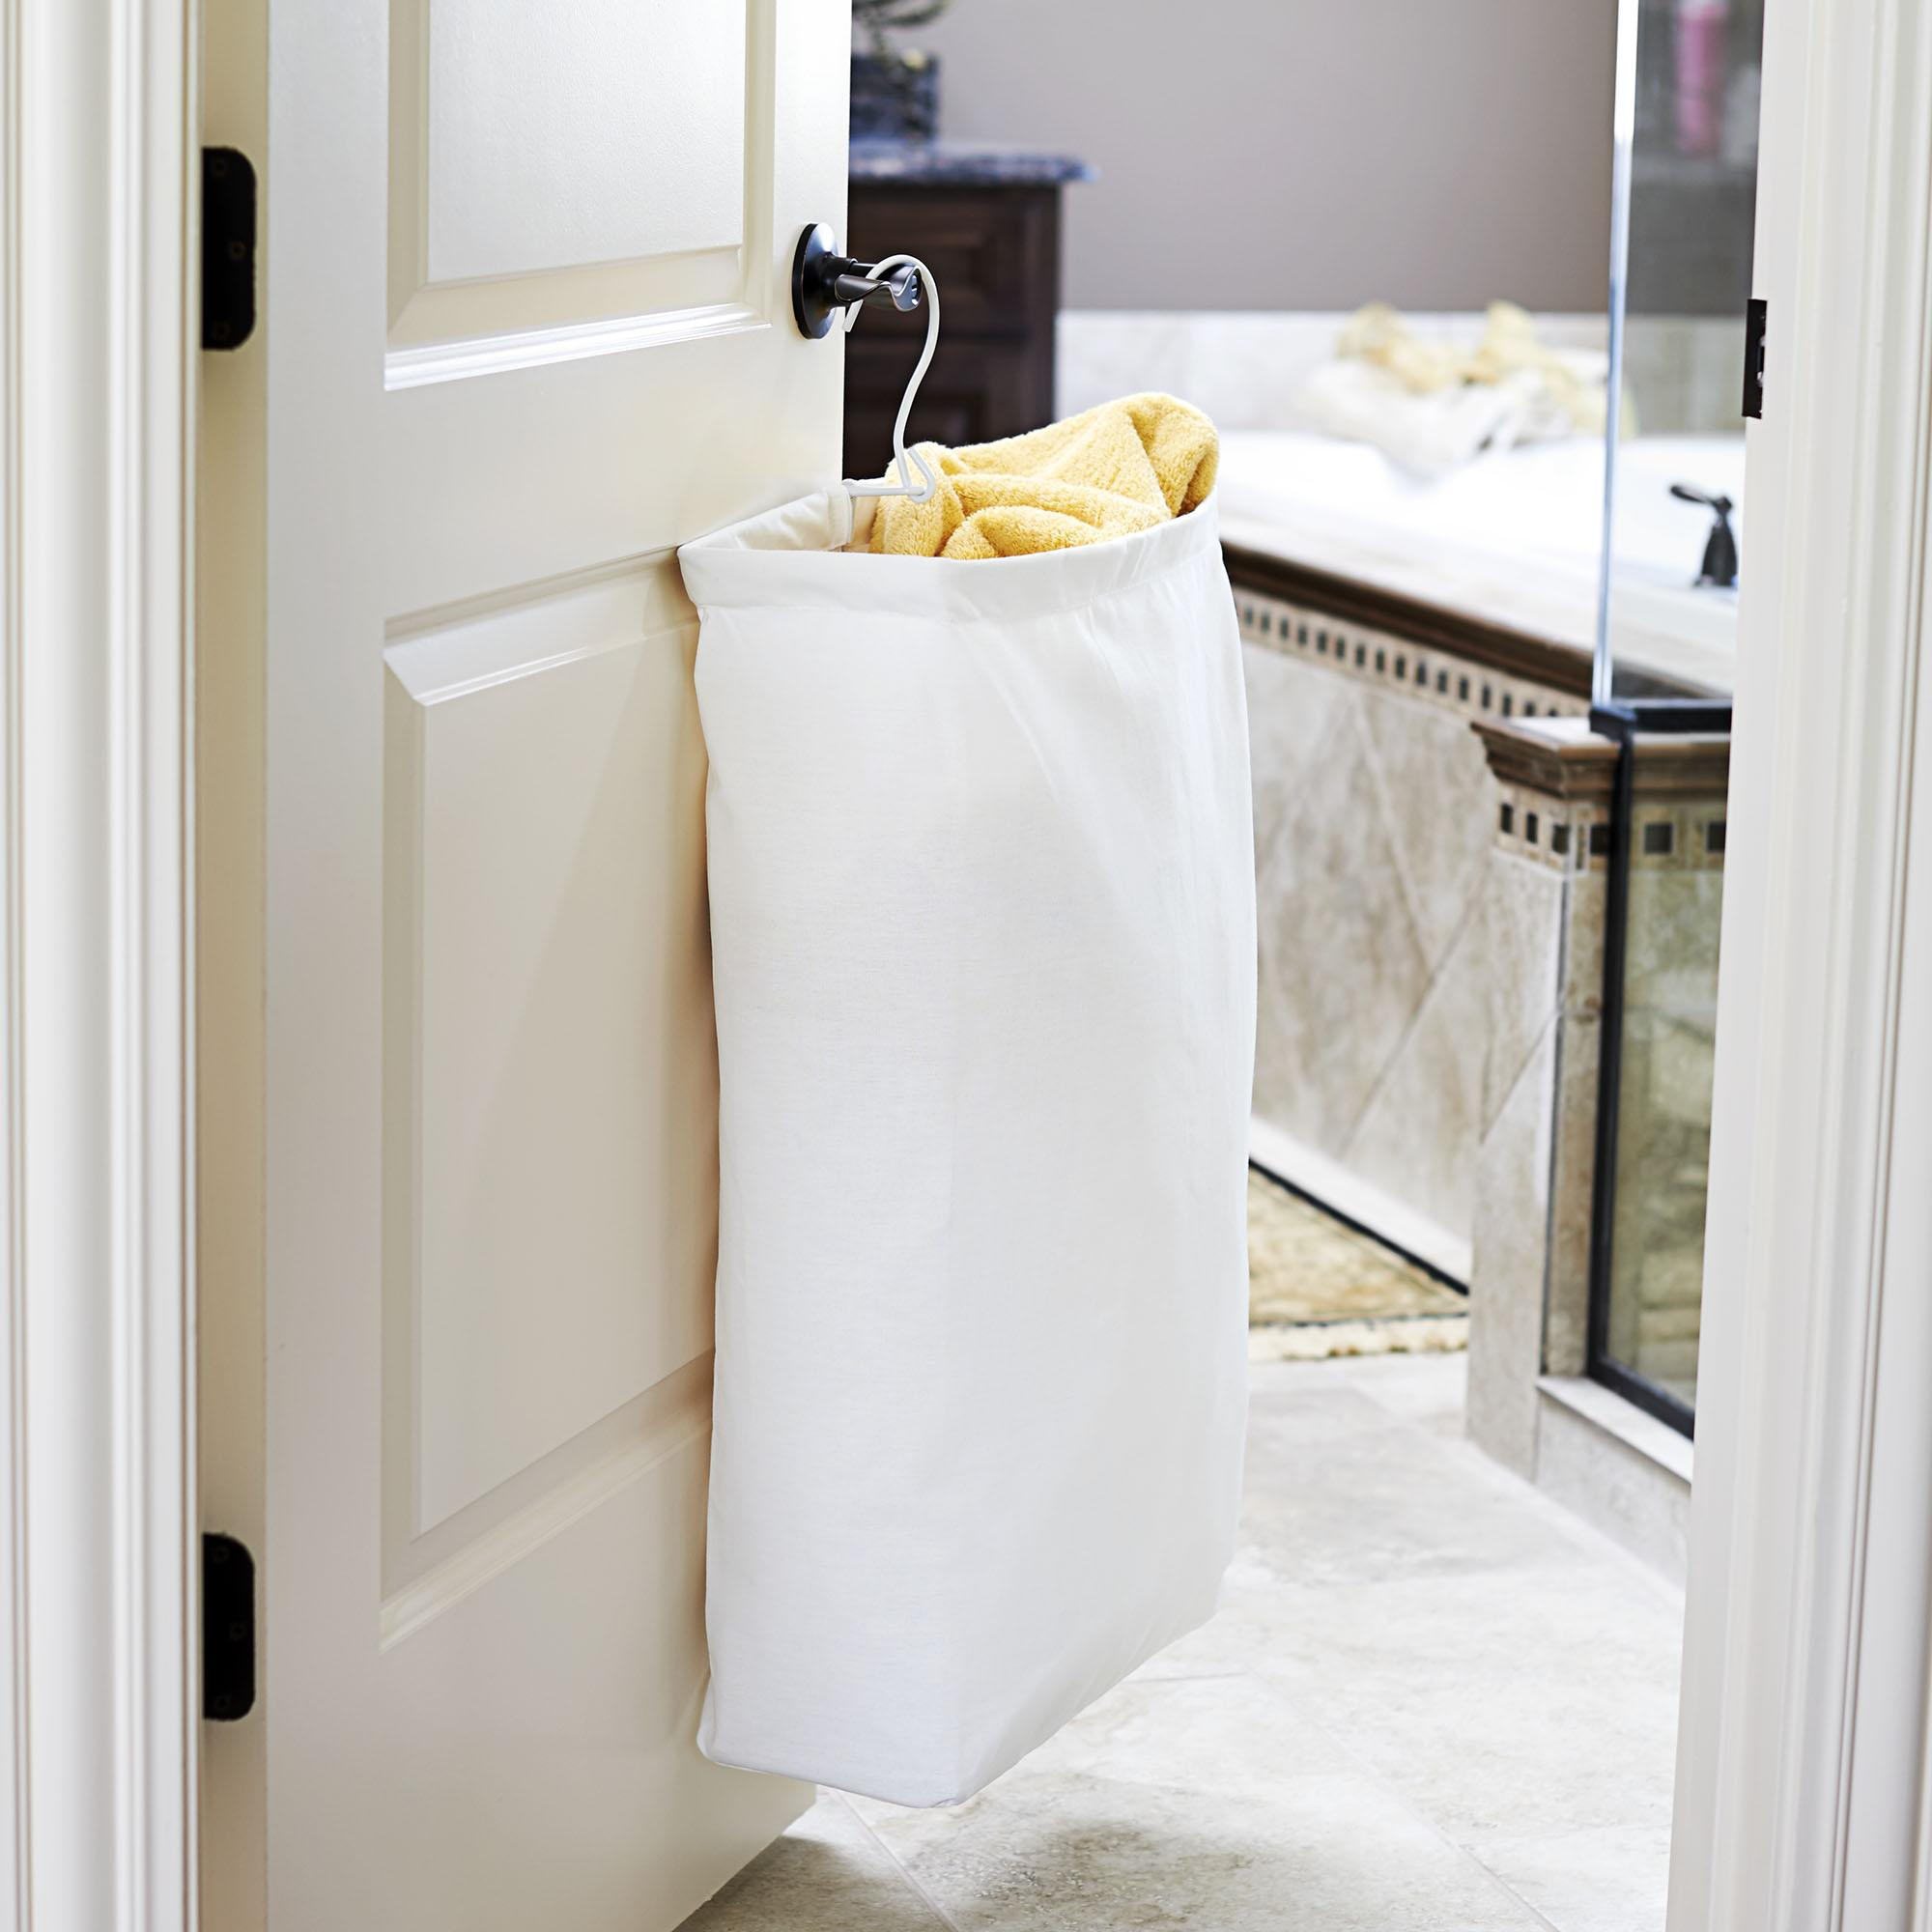 Amazon Com Household Essentials Hanging Cotton Canvas